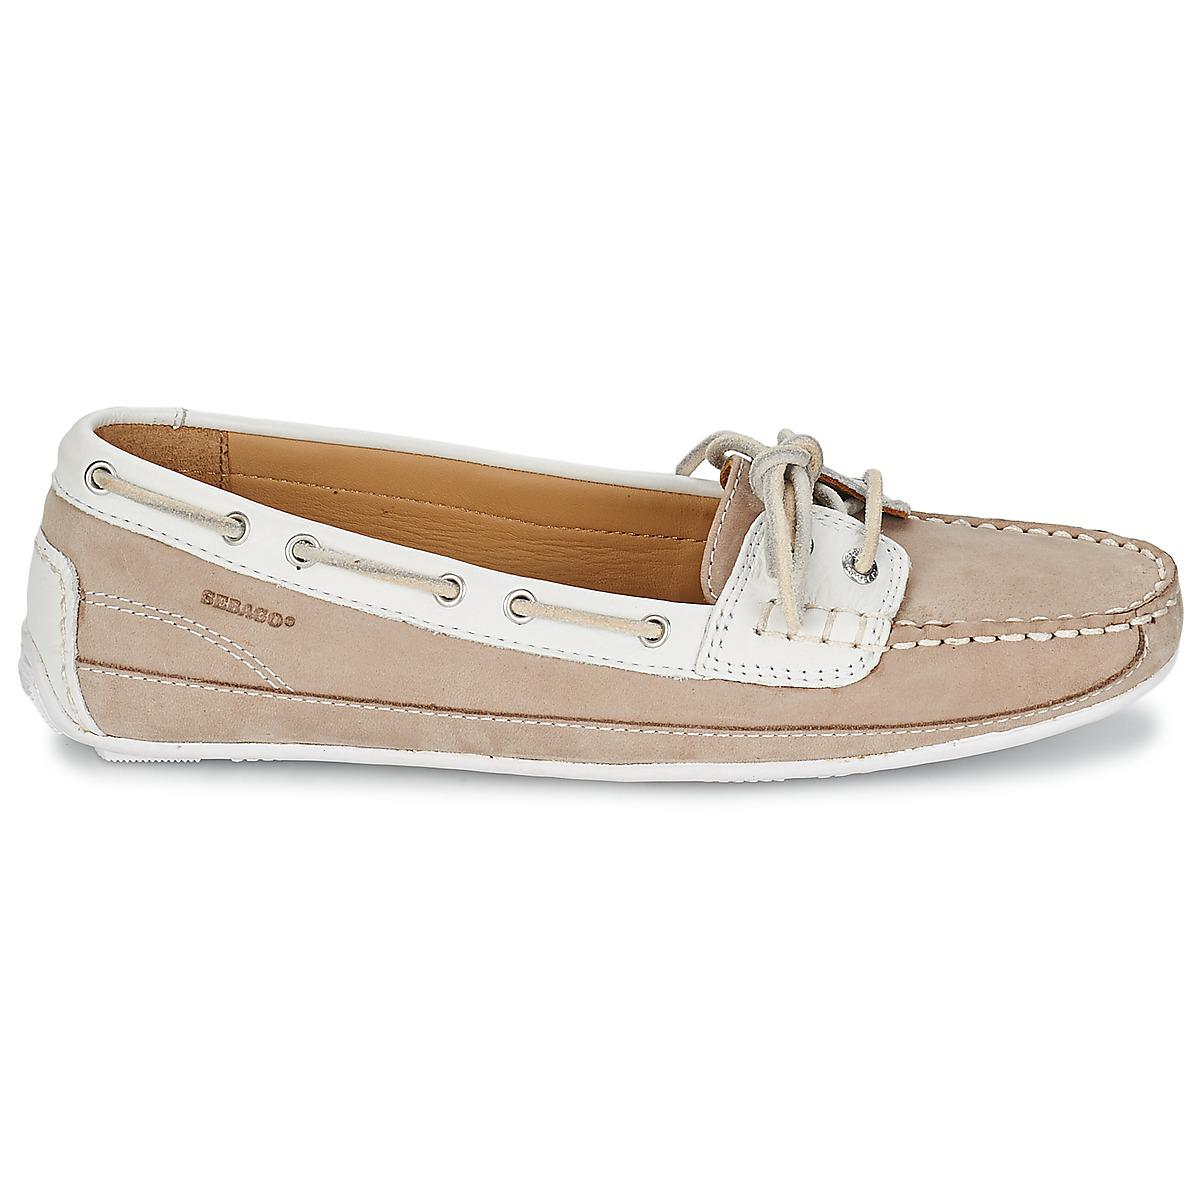 661fbb9f4440d Sebago - Natural Bala Women's Boat Shoes In Beige - Lyst. View fullscreen